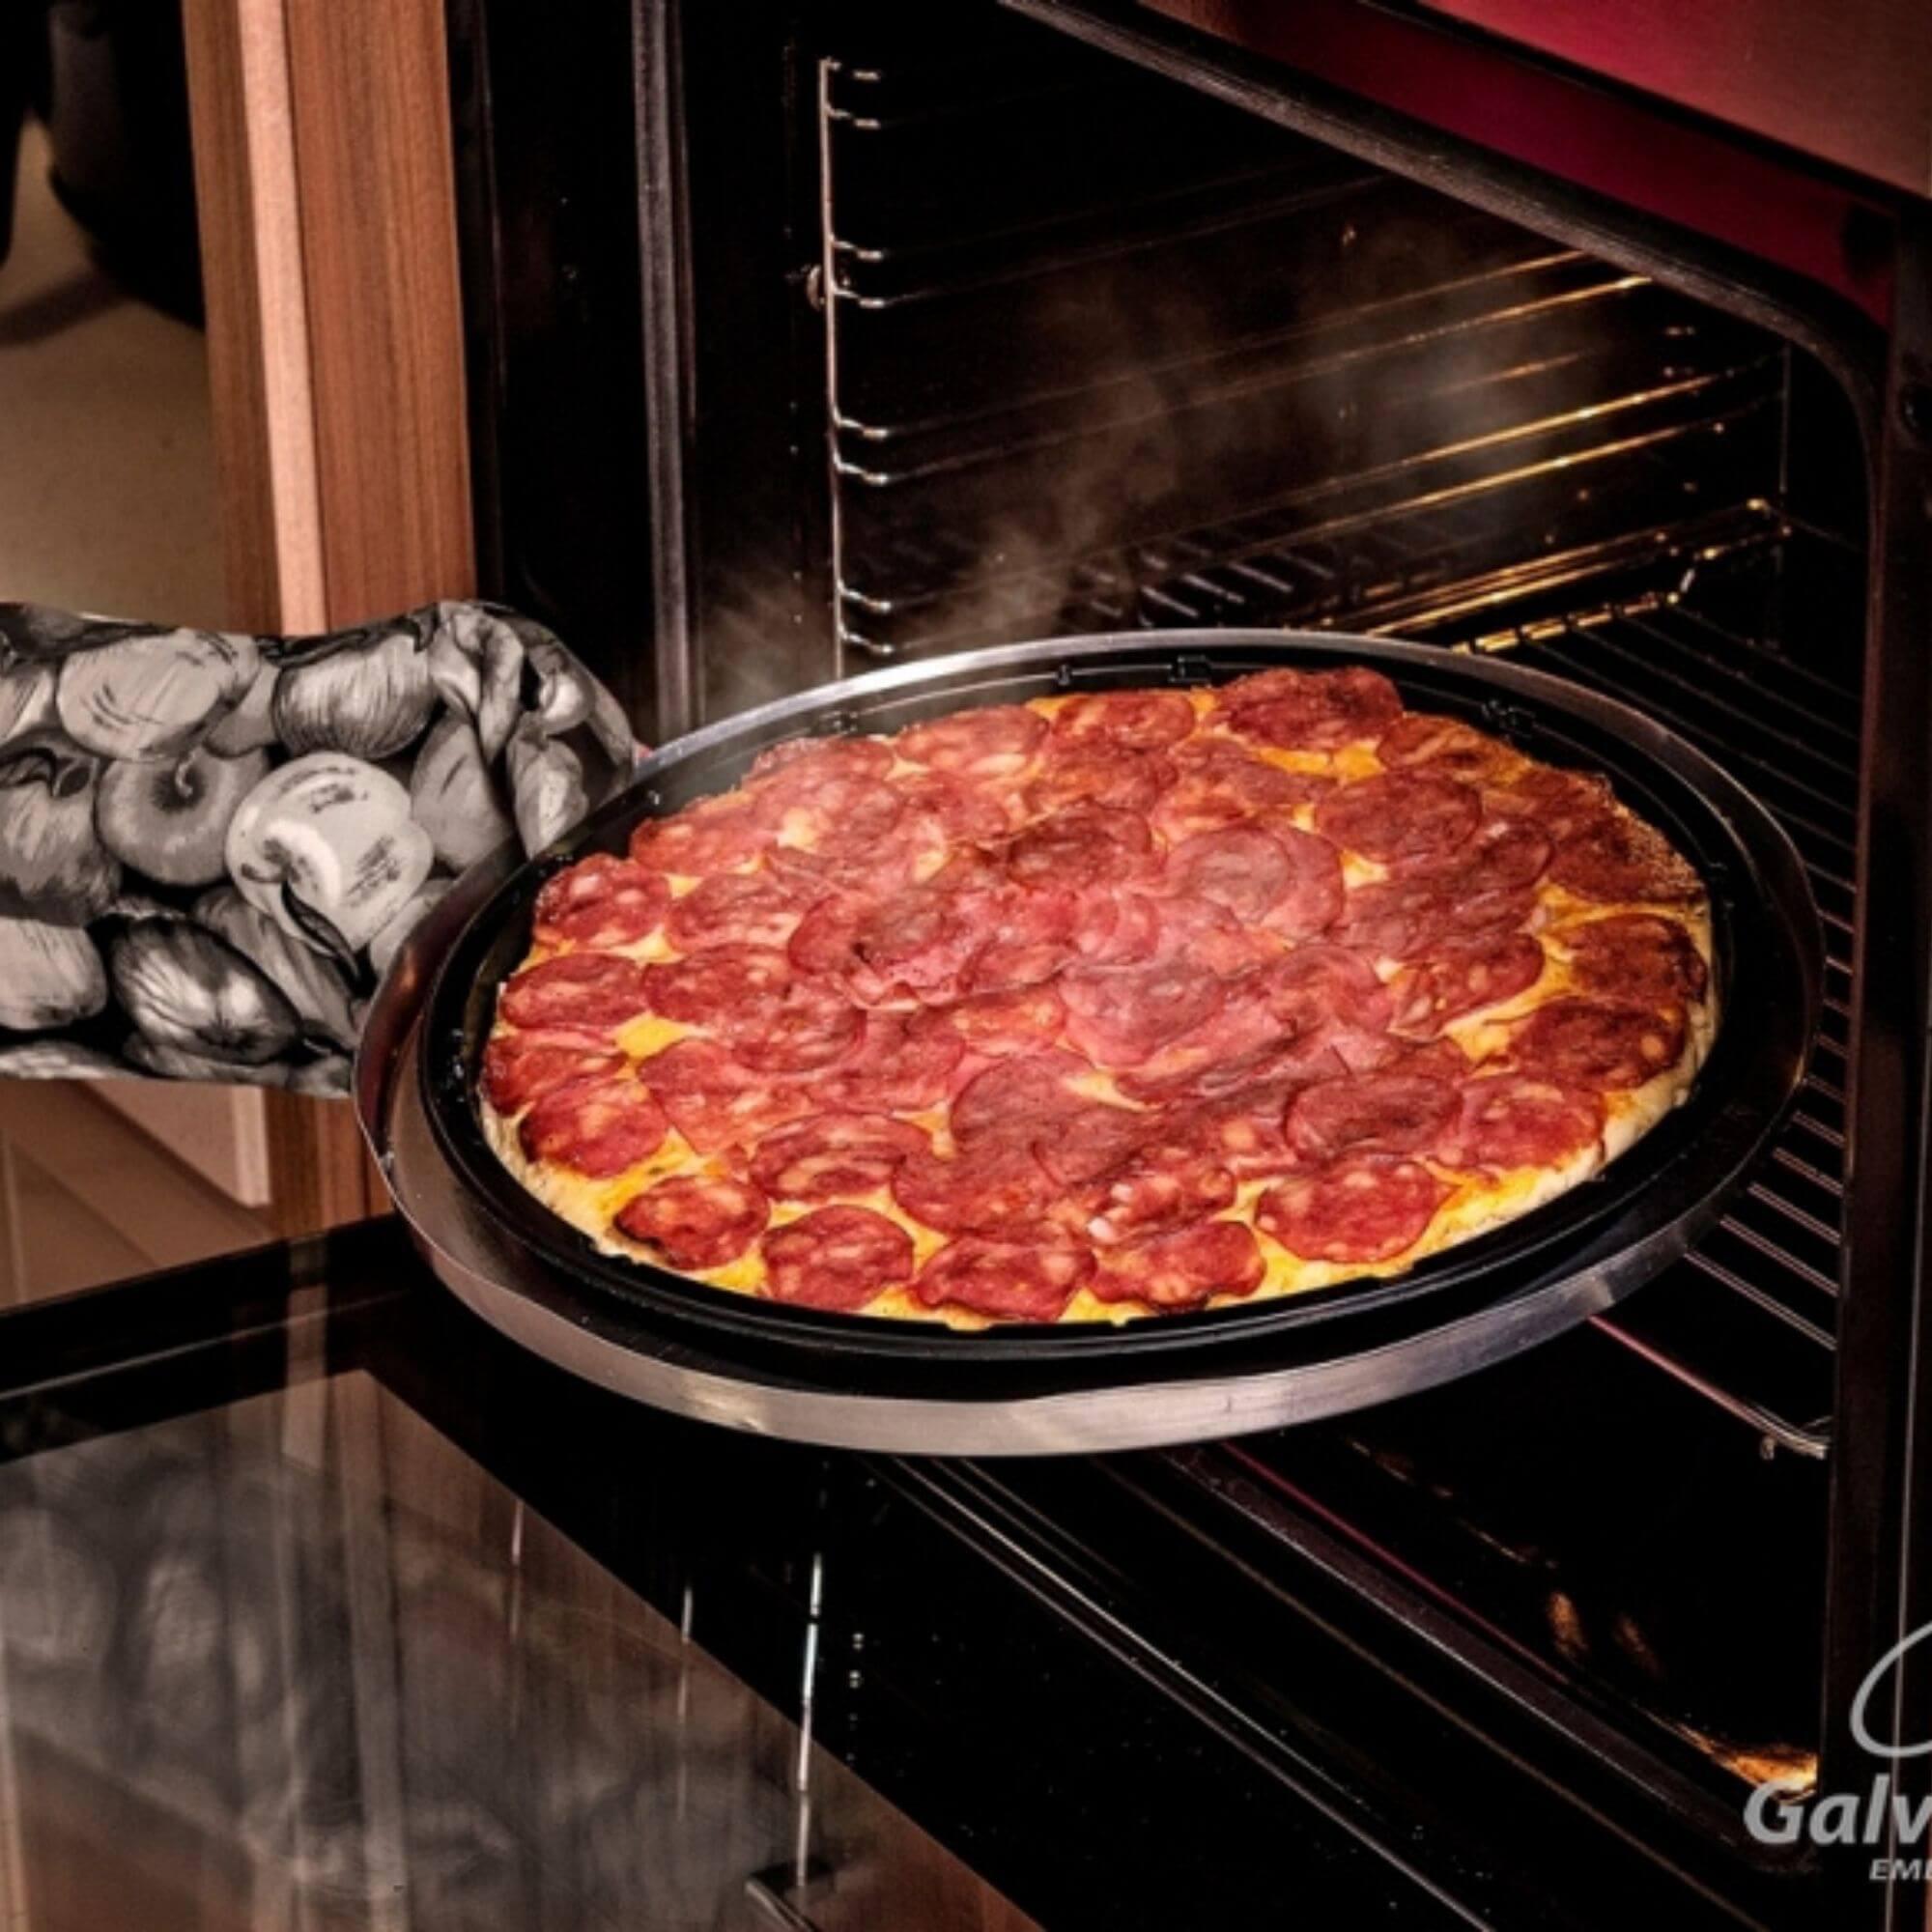 Embalagem Forneável para Pizza forno a gás - Galvanotek G230